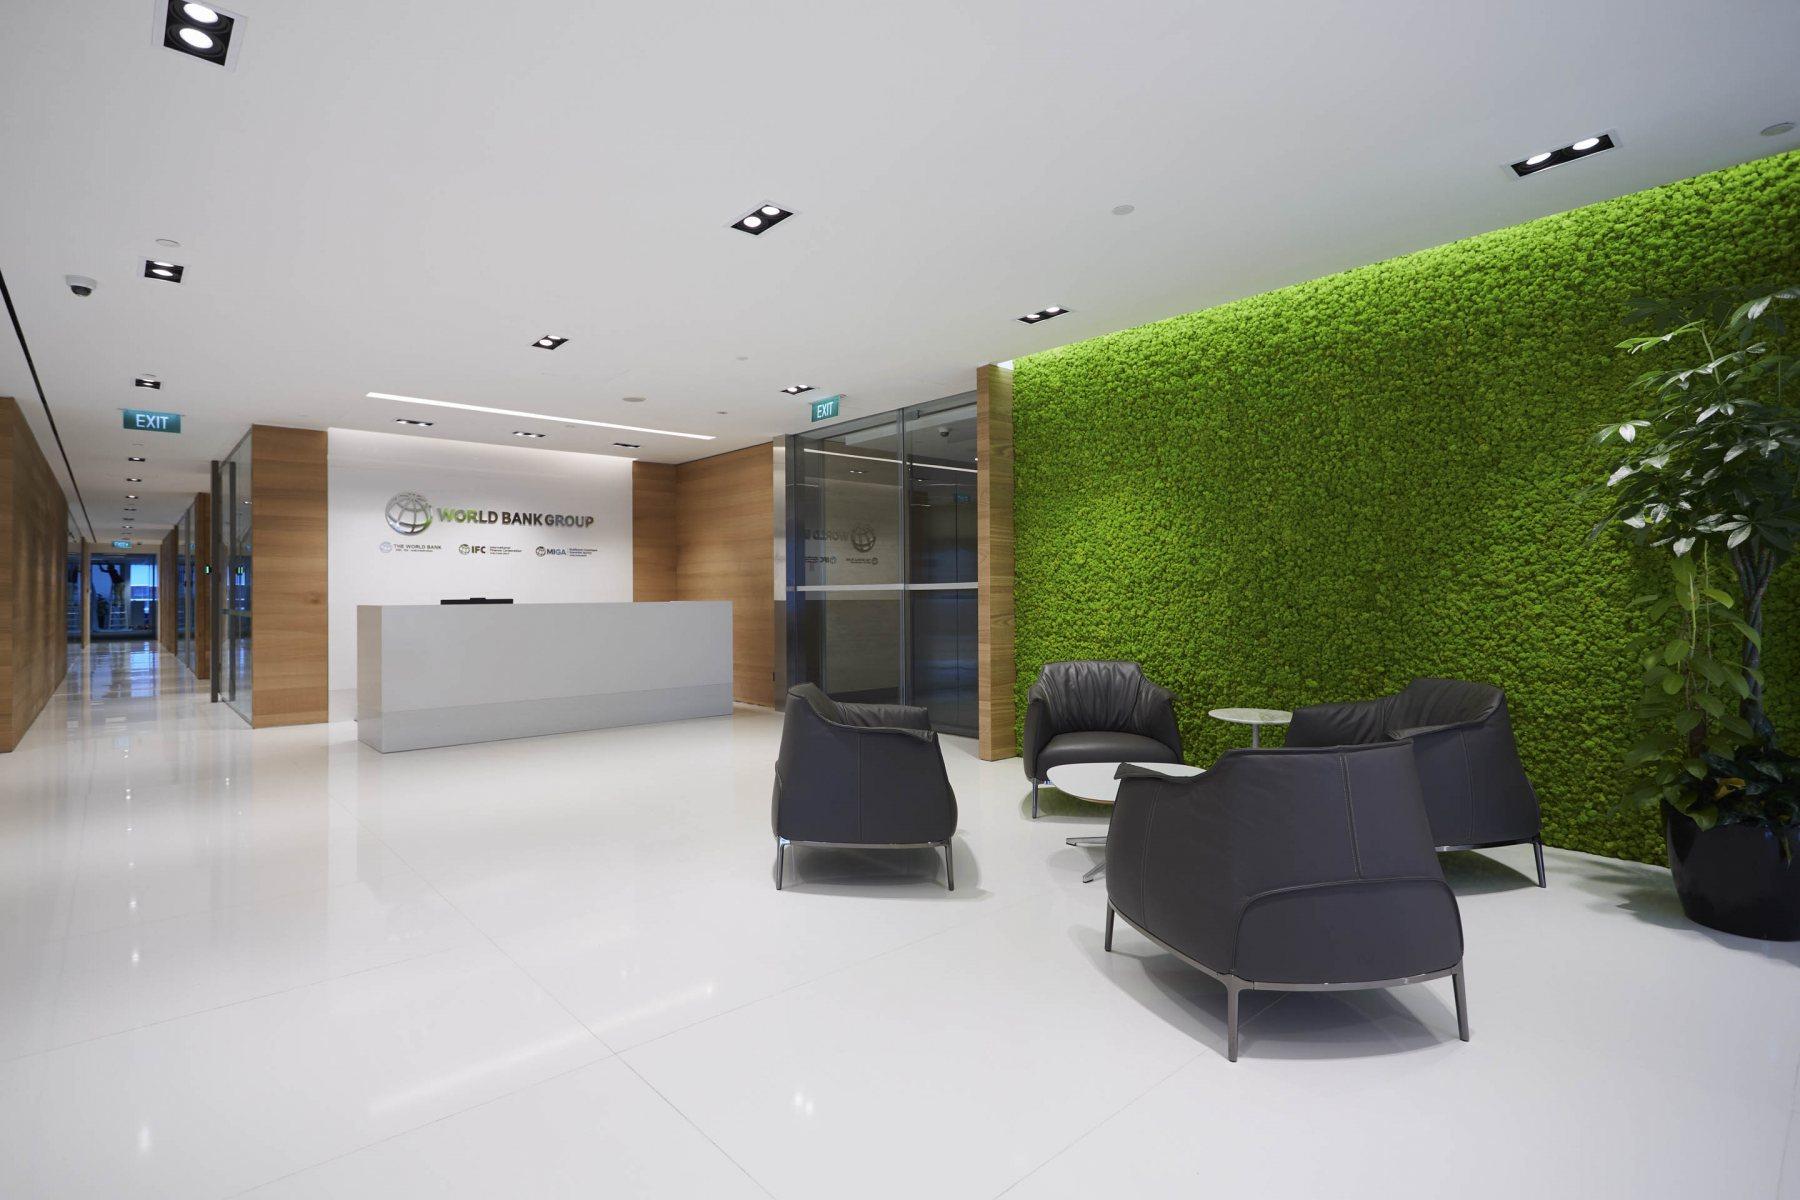 Interior-Phography-Singapore-D_Perception-8